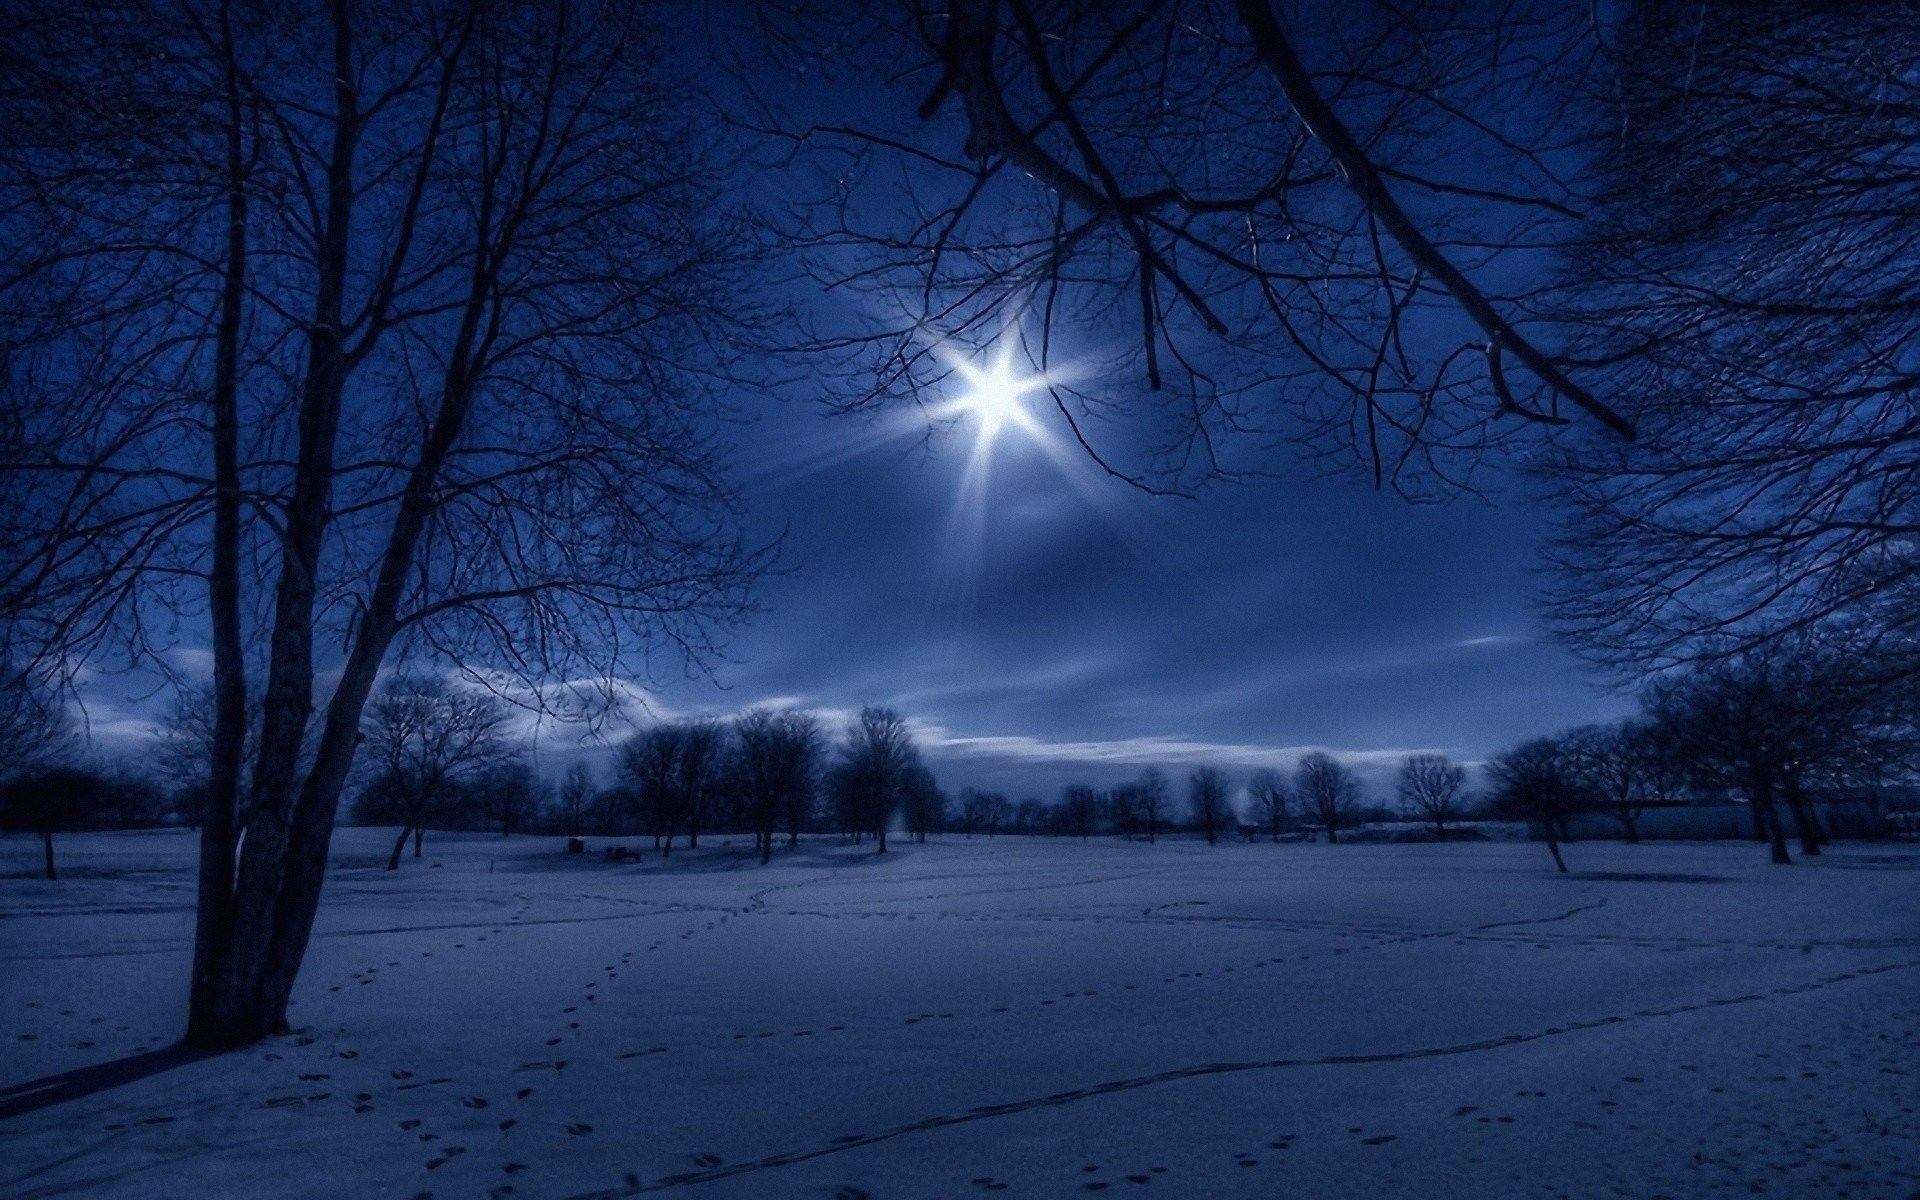 Winter Sky Wallpapers Top Free Winter Sky Backgrounds